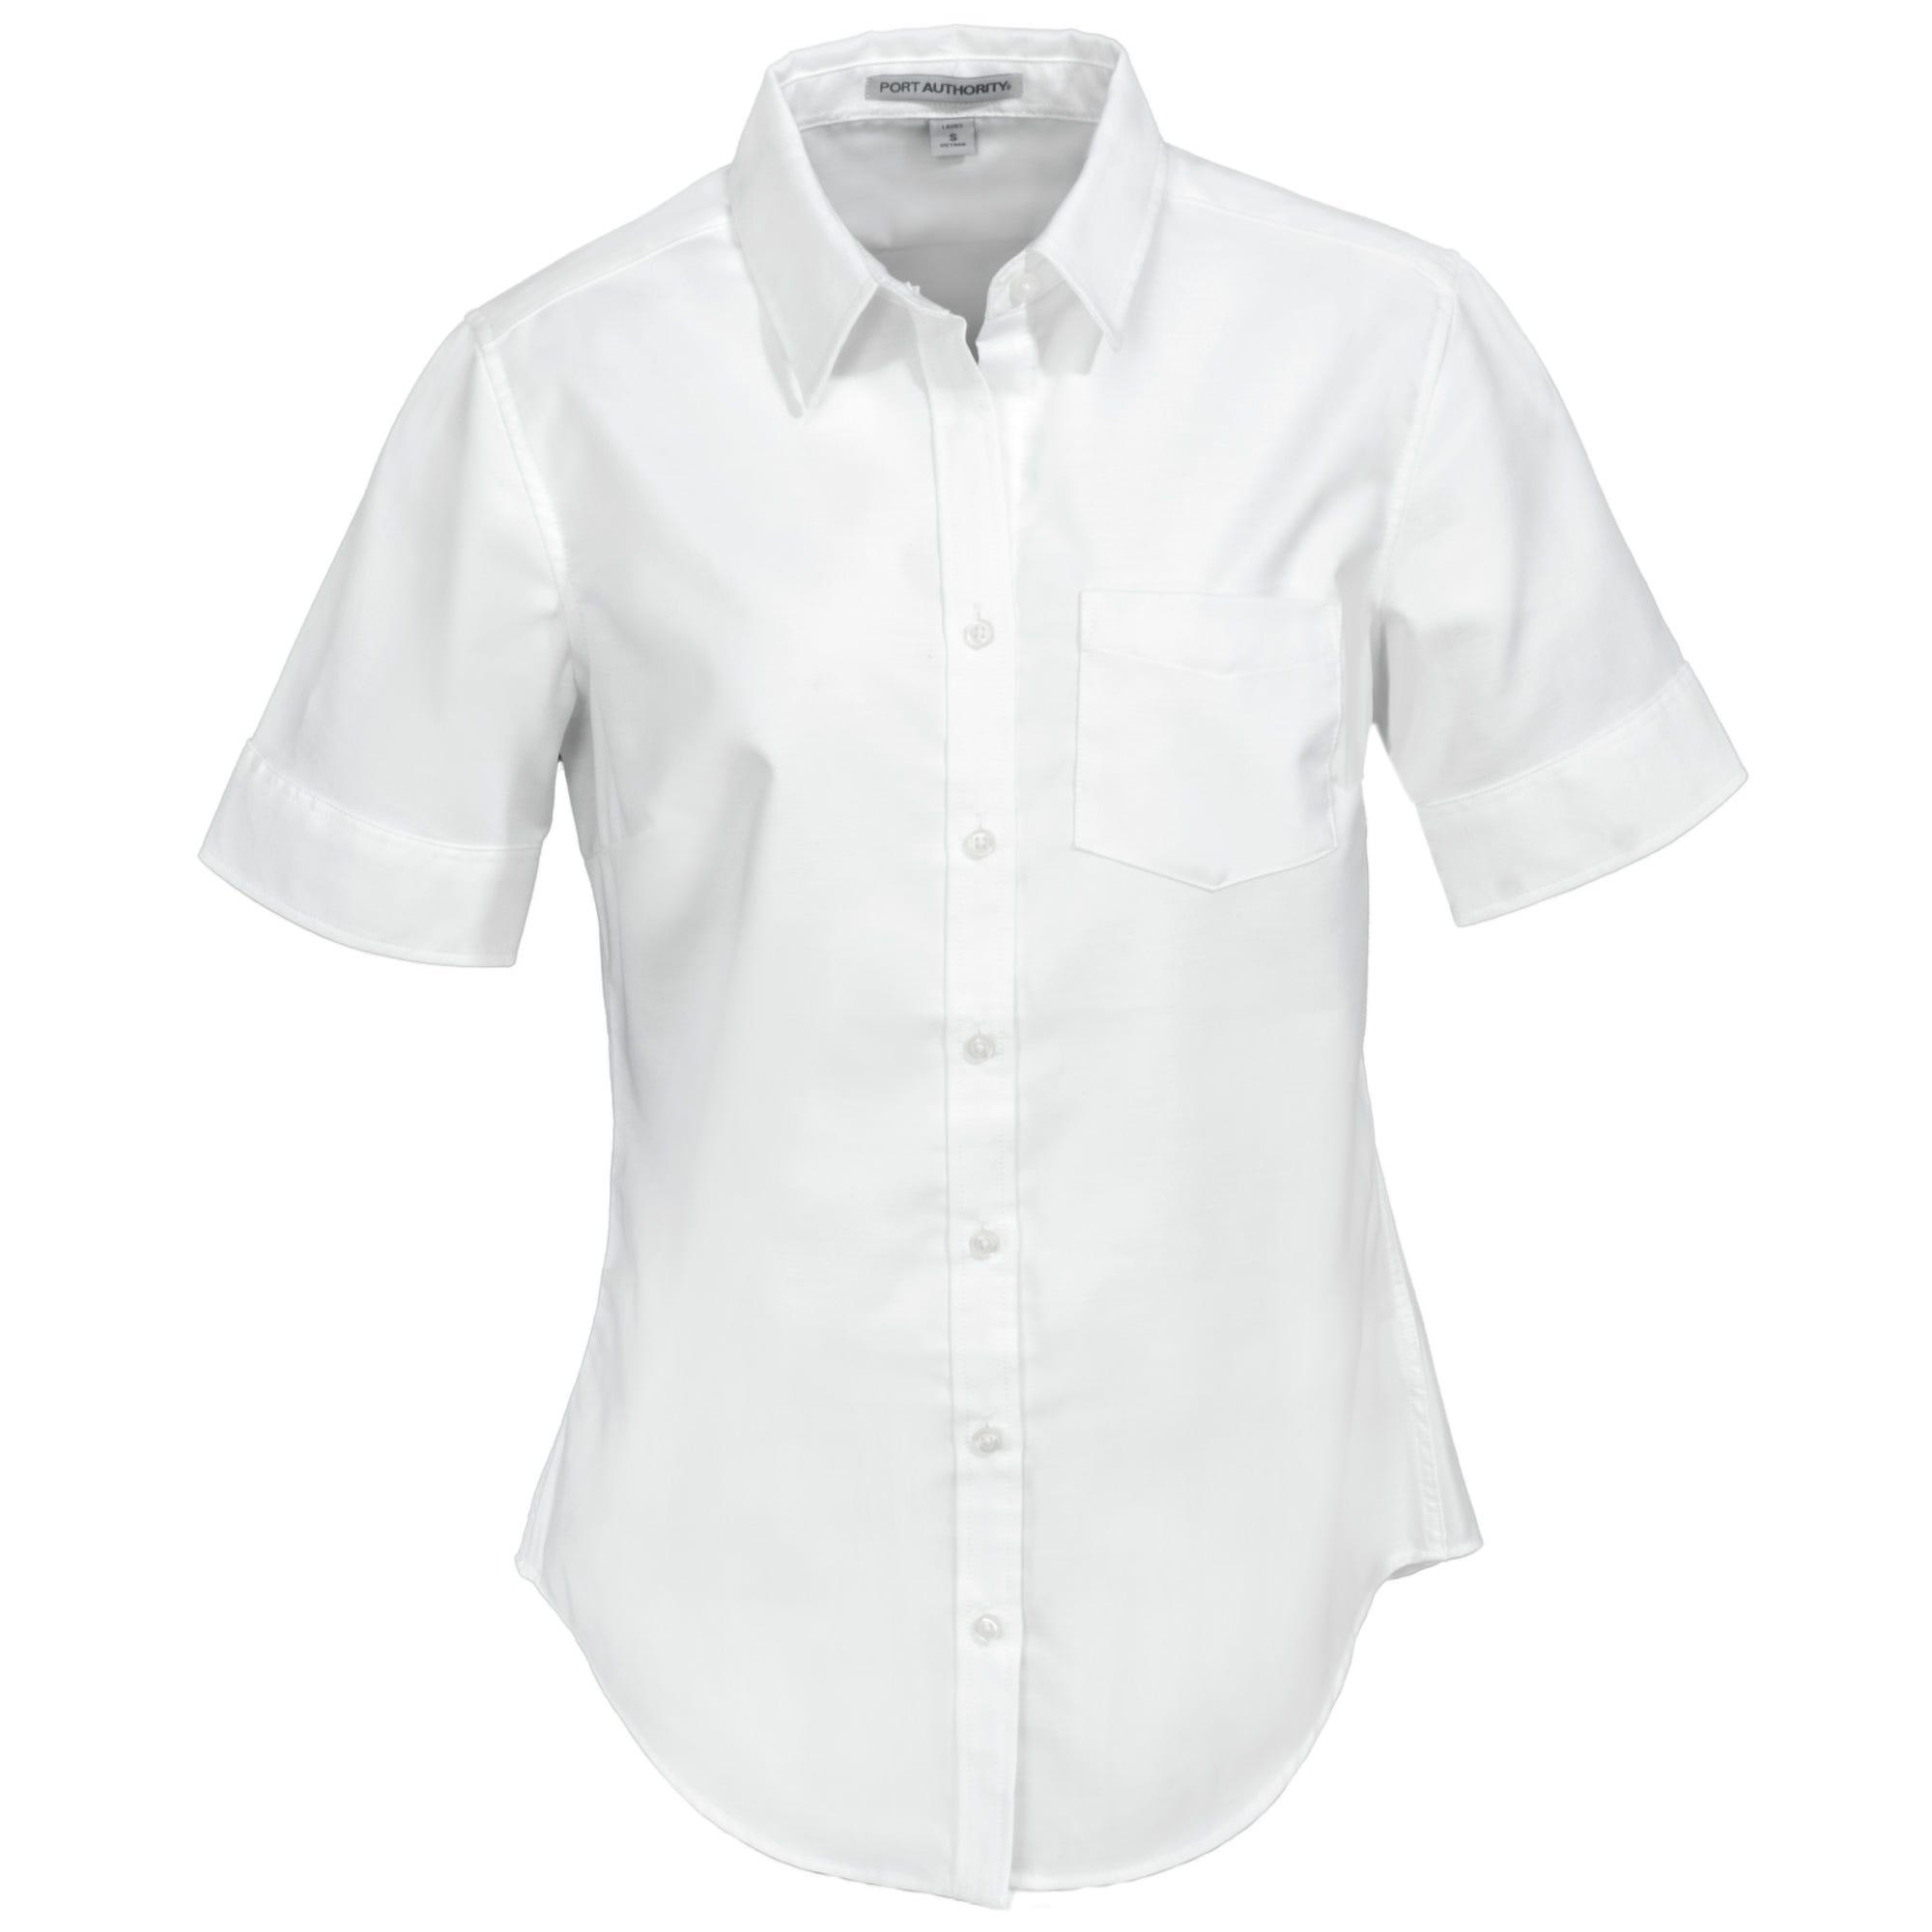 Port Authority Shirts Women 39 S L659 Wht White Superpro